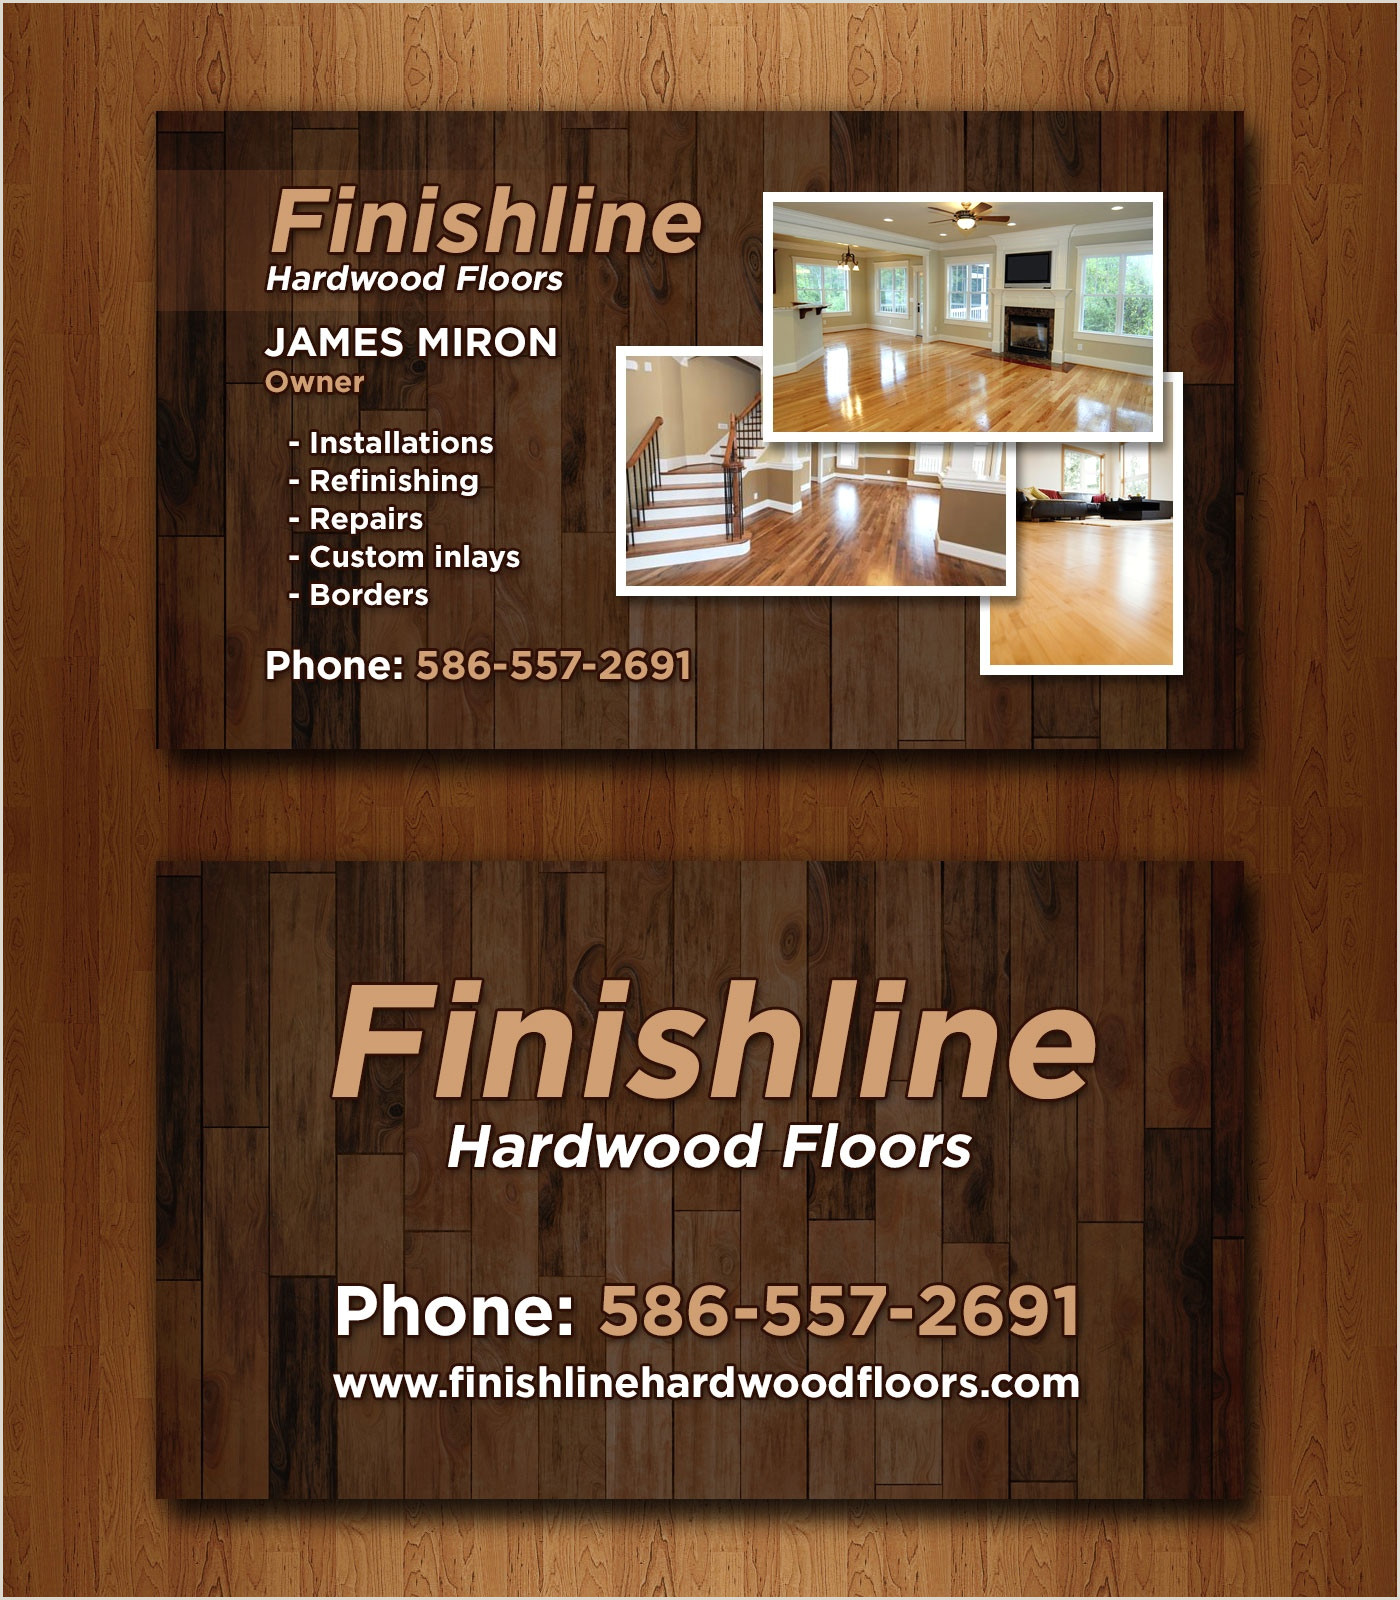 Card Layout Ideas 14 Popular Hardwood Flooring Business Card Template